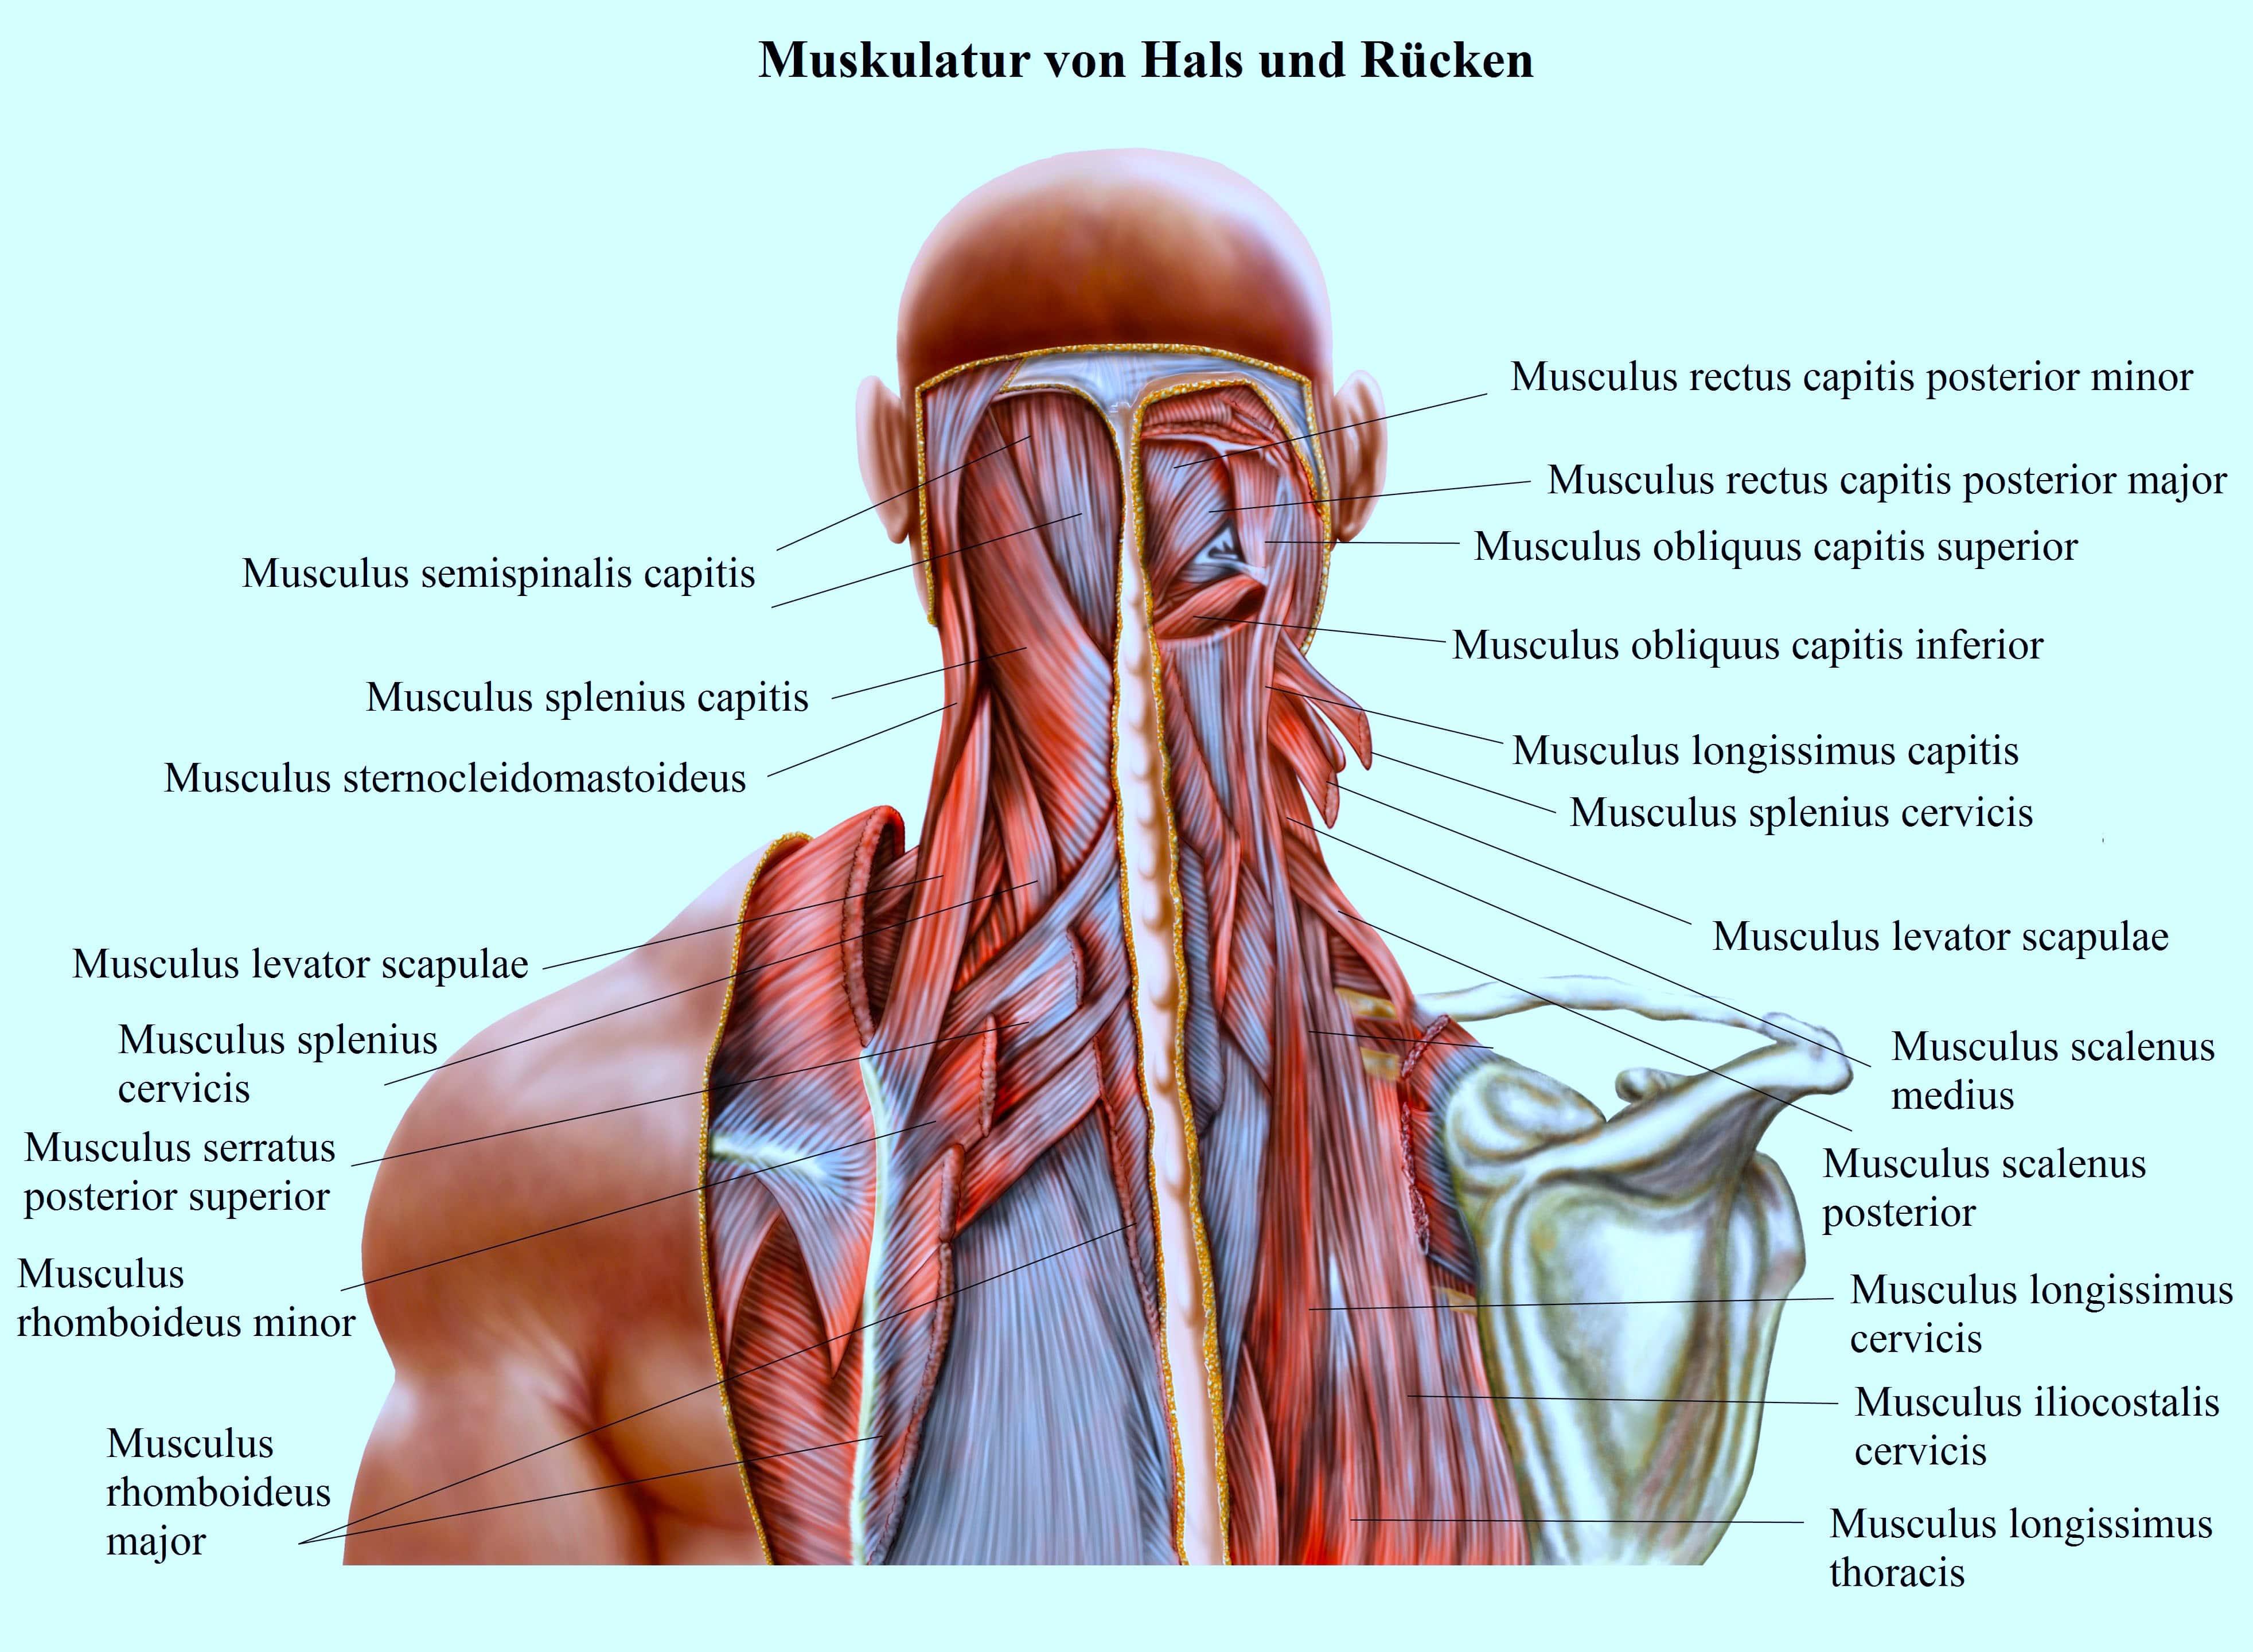 Muskulatur-Hals-Rücken-Rhomboideus - Symptome und Behandlung